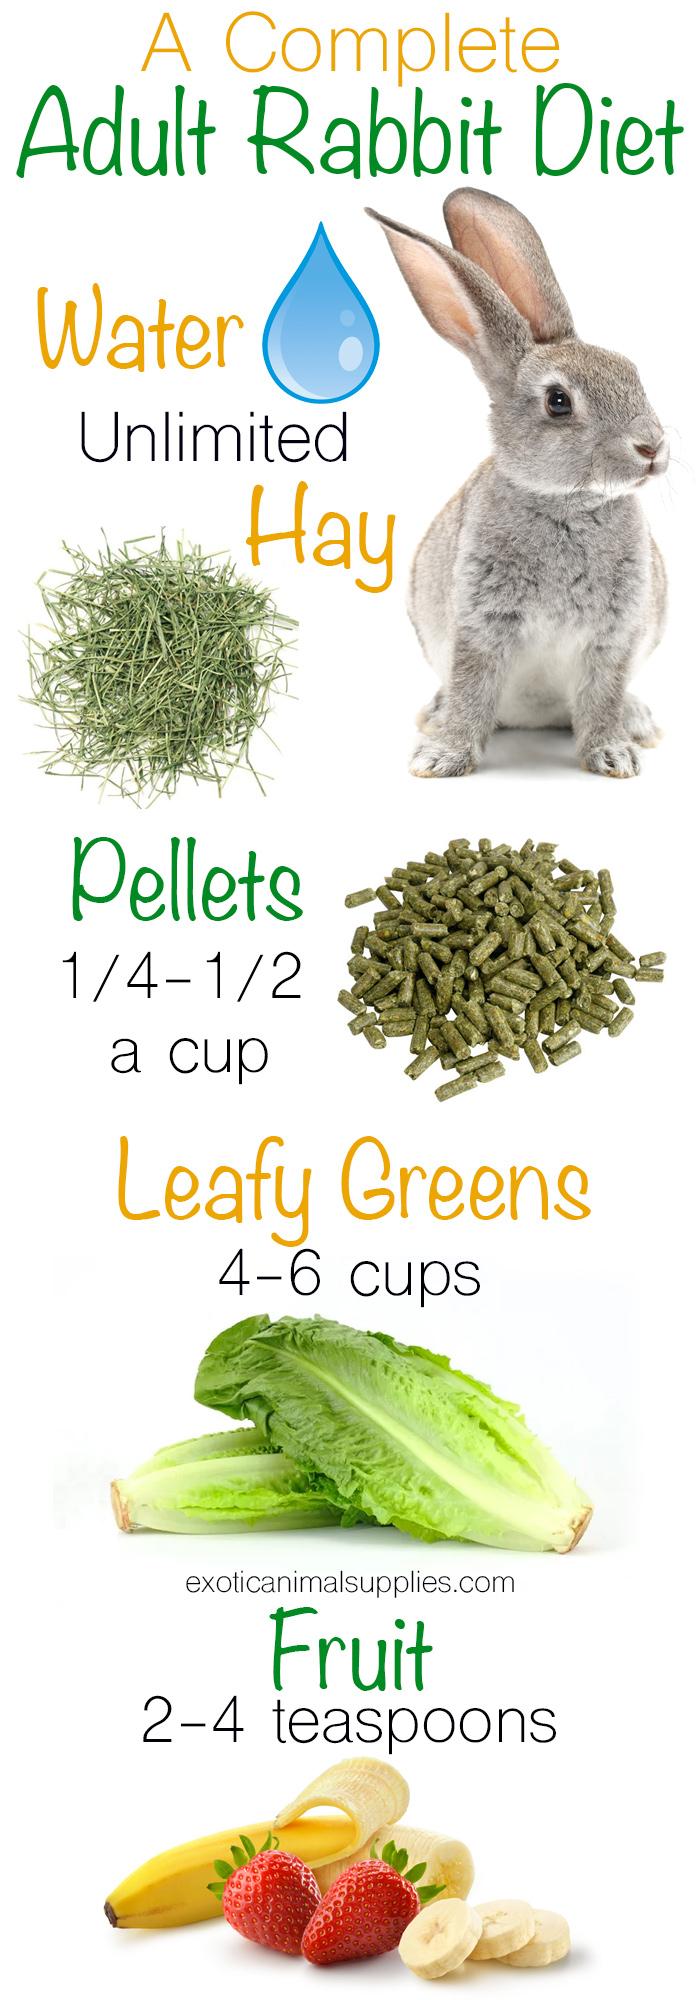 Pet Rabbit Diet: Bunny Food & Nutrition - Exotic Animal Supplies